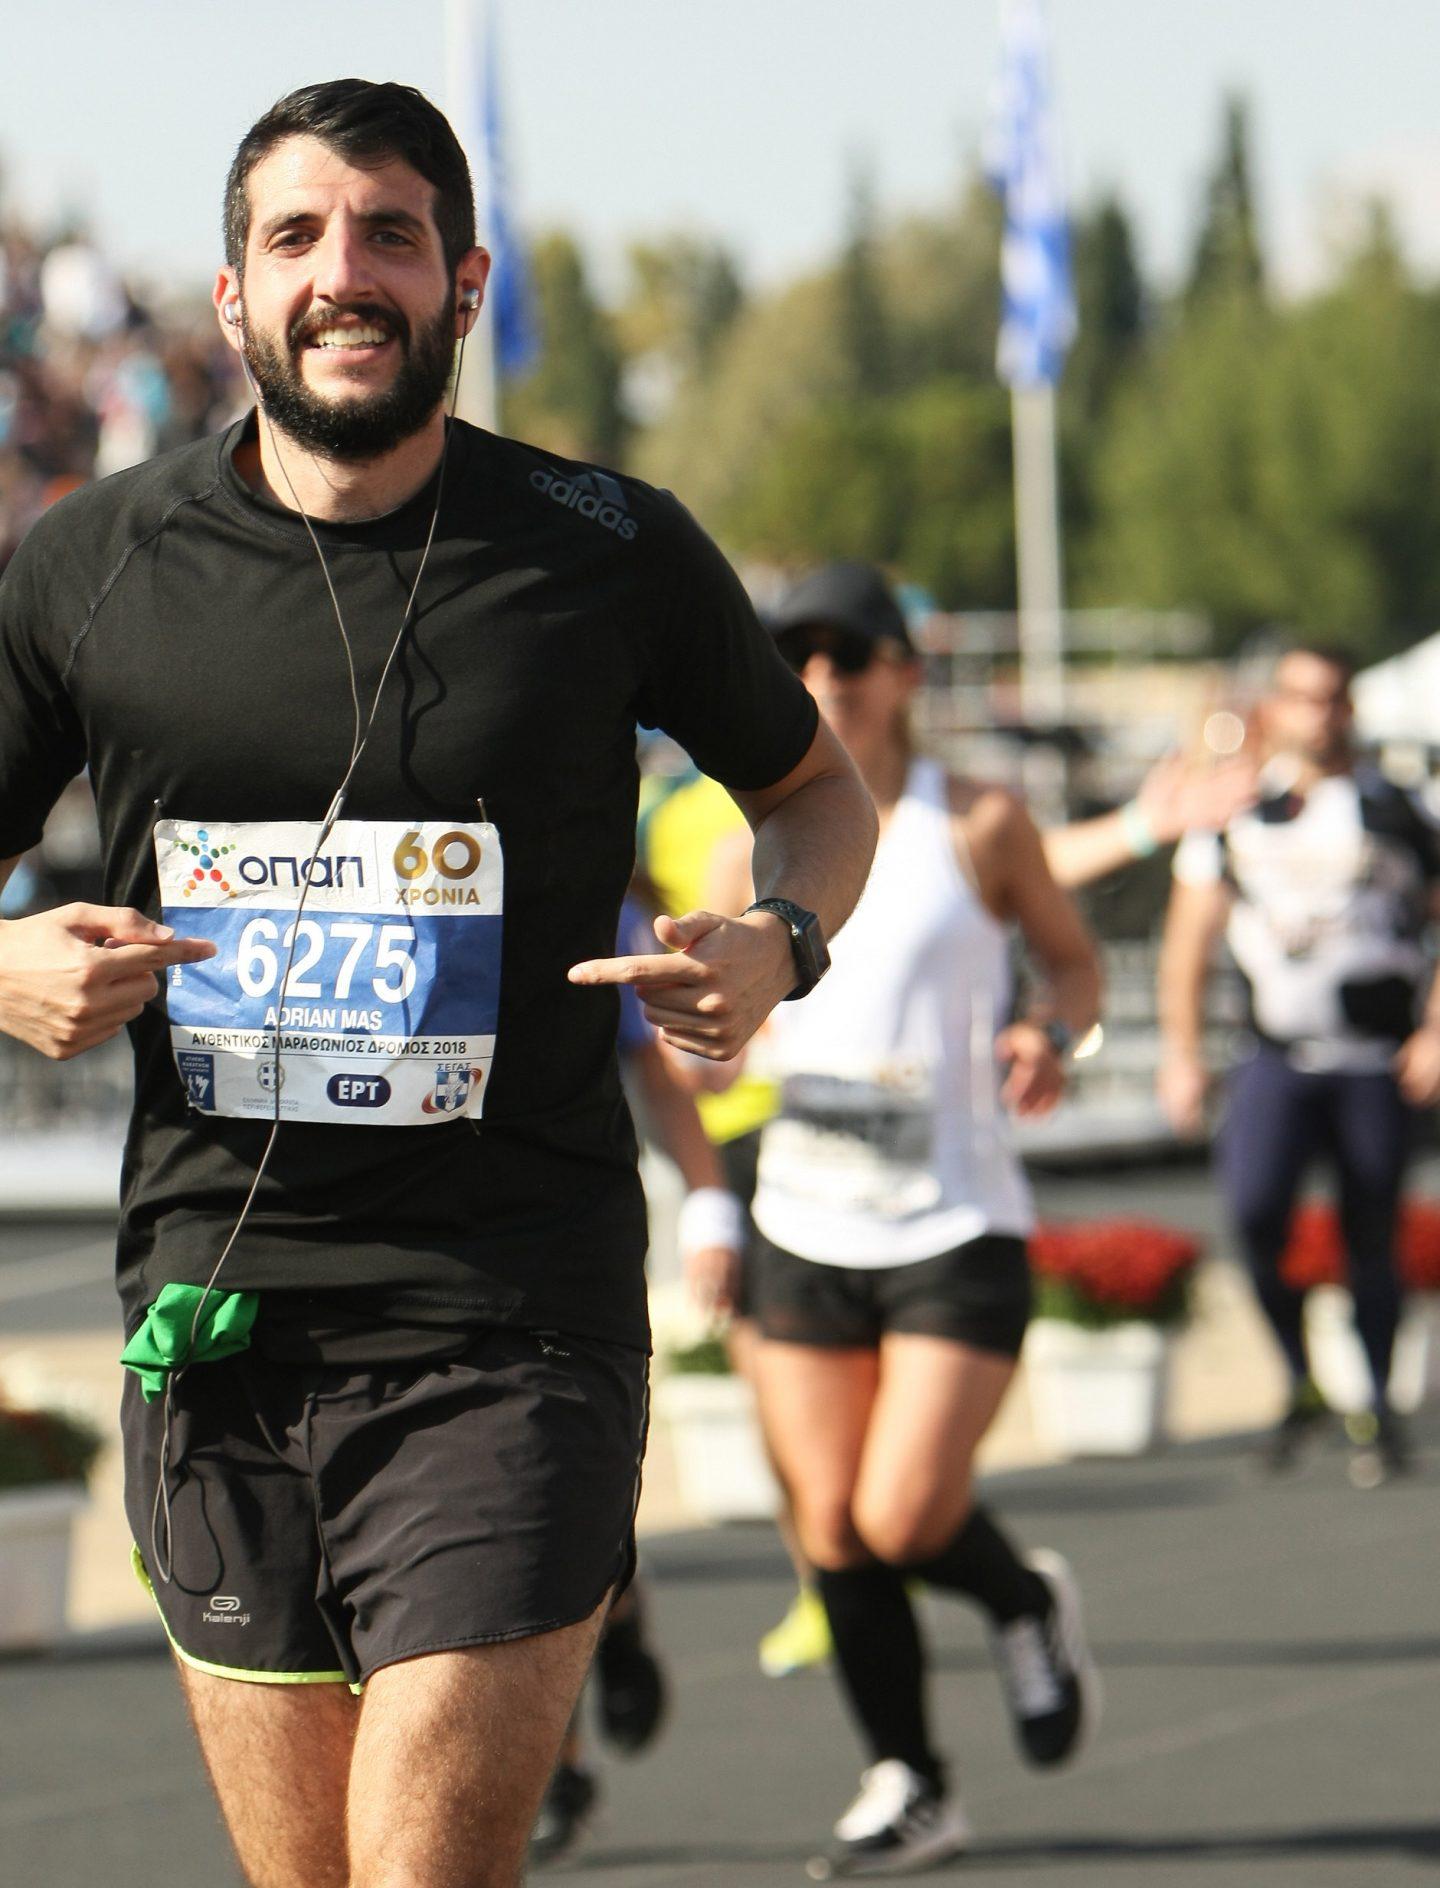 Adrian Mas while running a marathon. GamePlan A